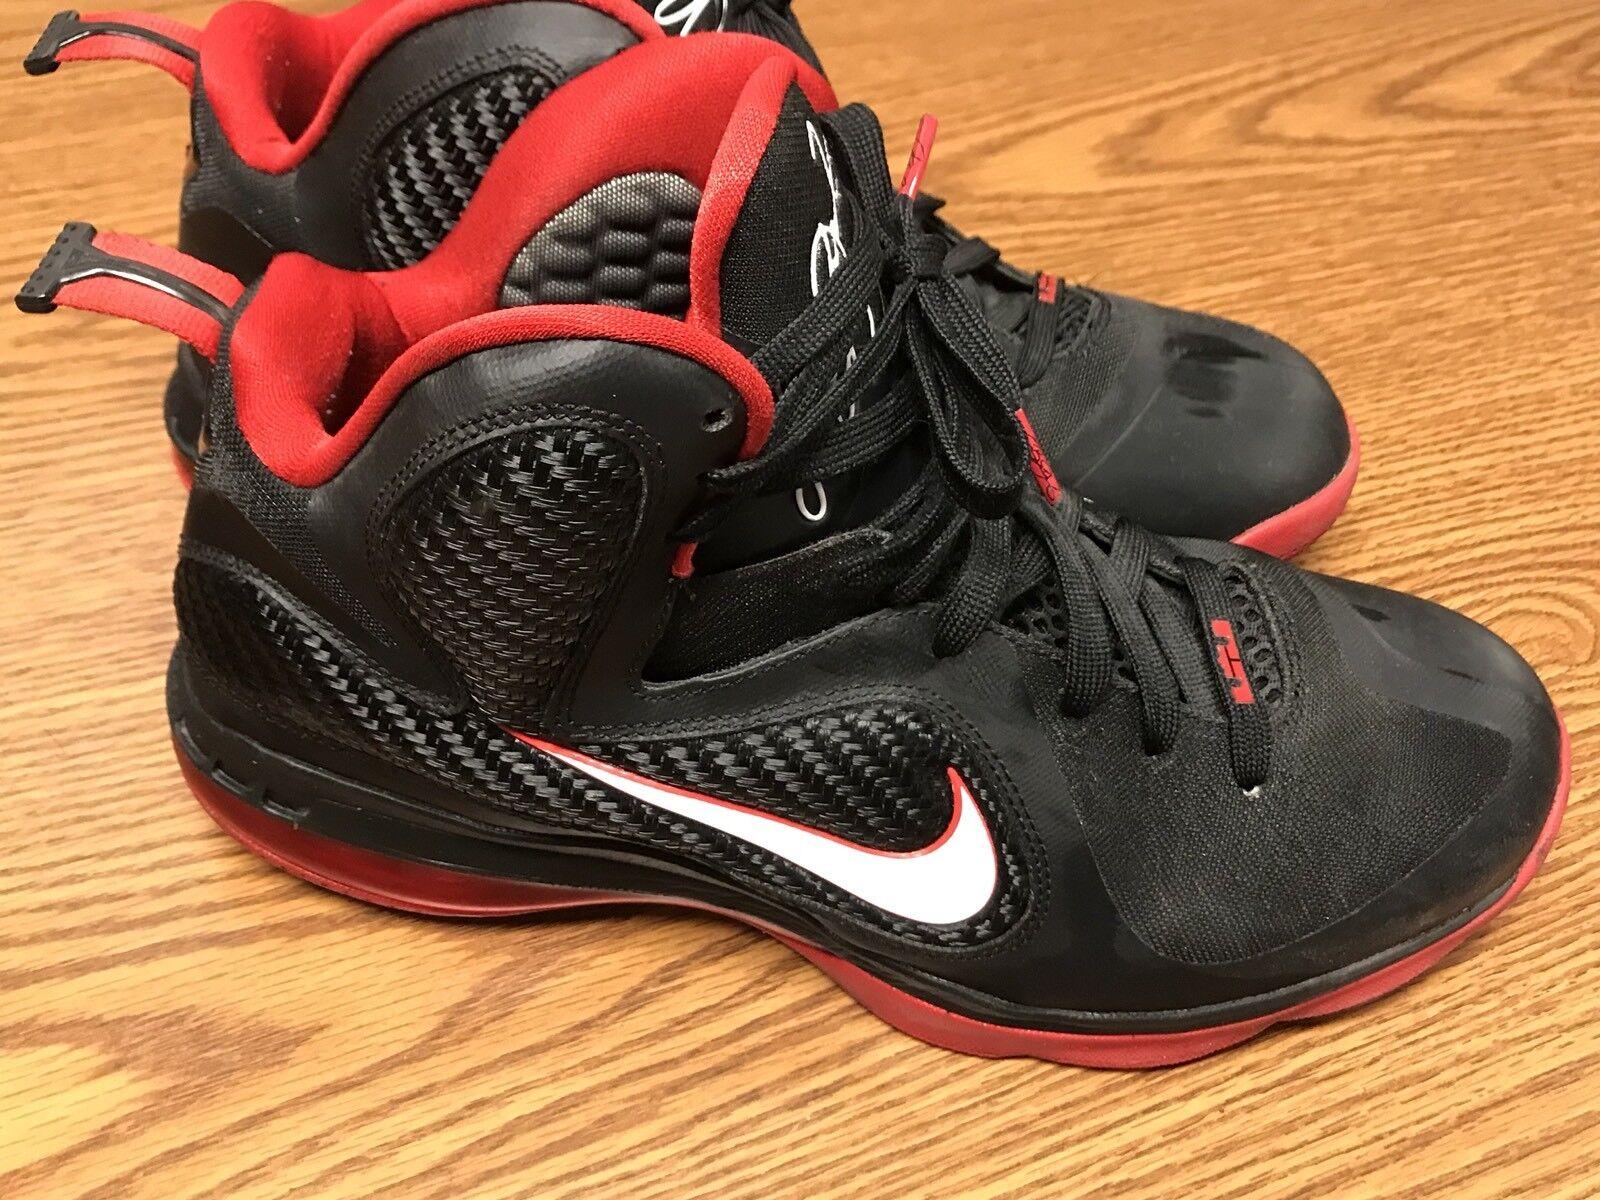 Nike 469764 003 Lebron 9 IX Black White Sport Red Miami Heat Athletic Shoe Sz 11